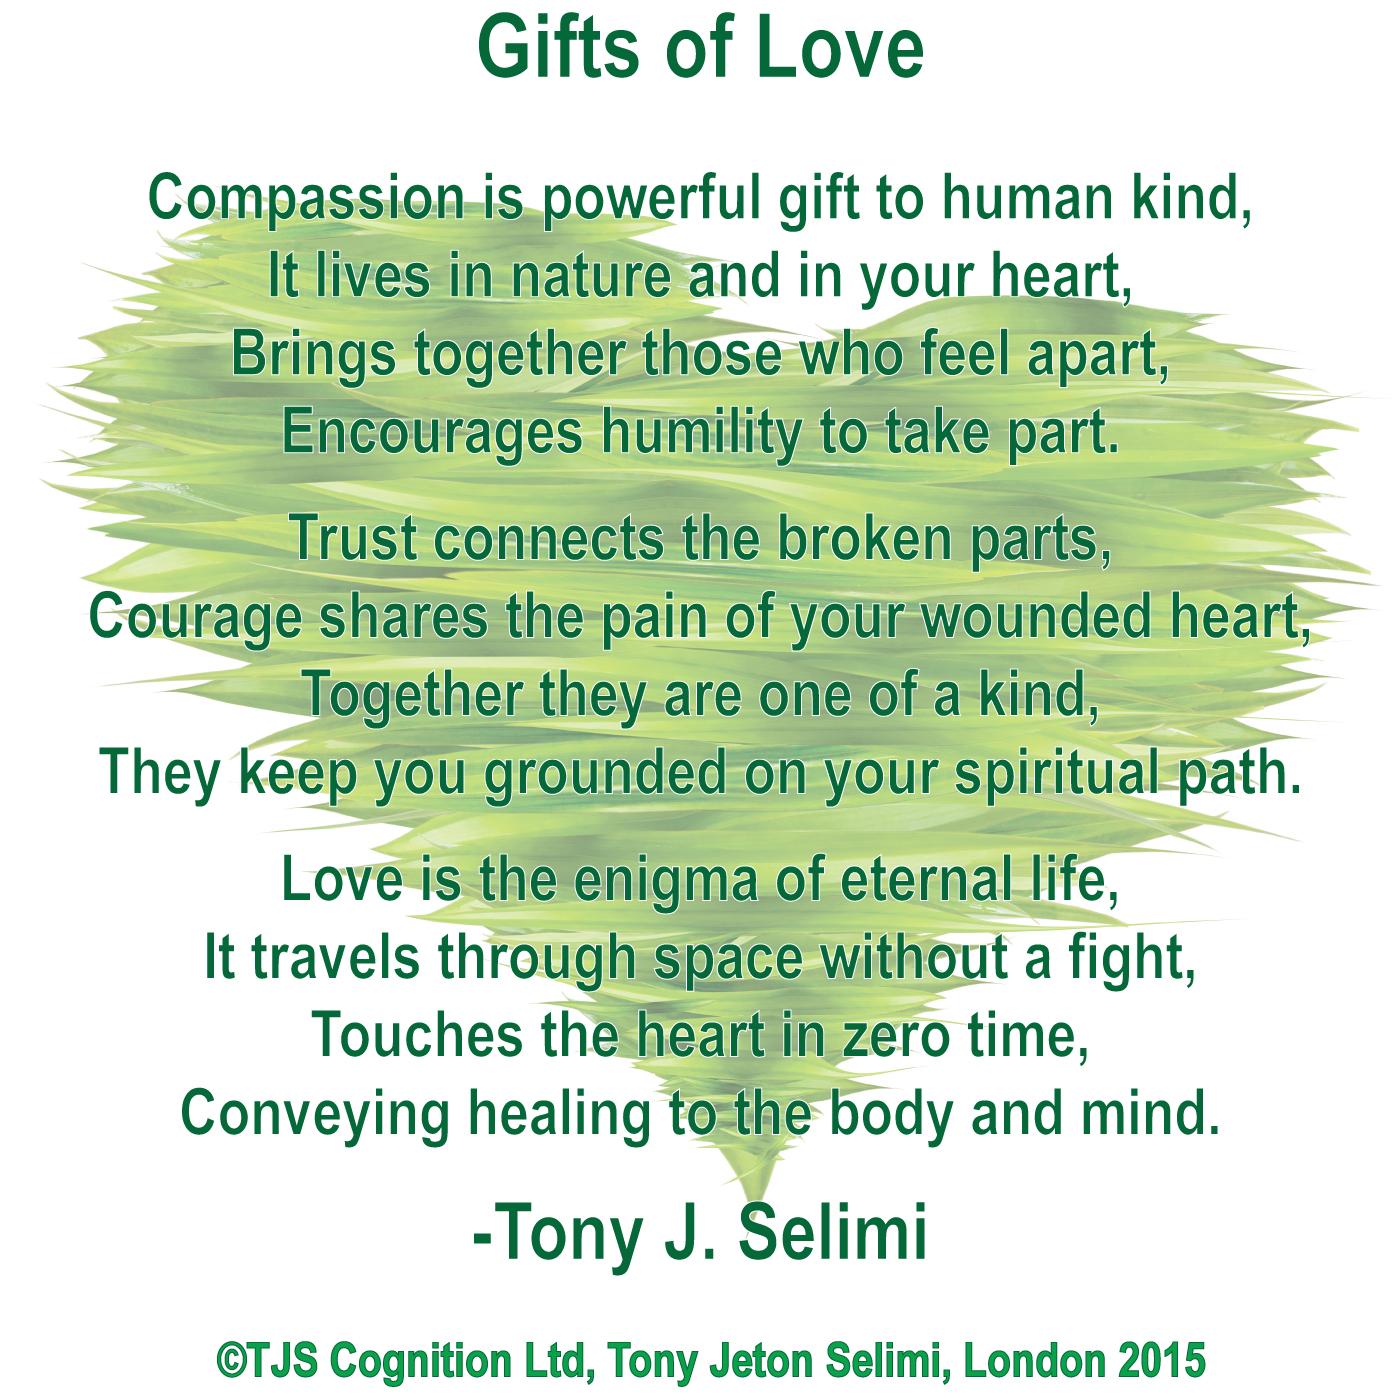 Gift-of-Love-by-Tony-J-Selimi